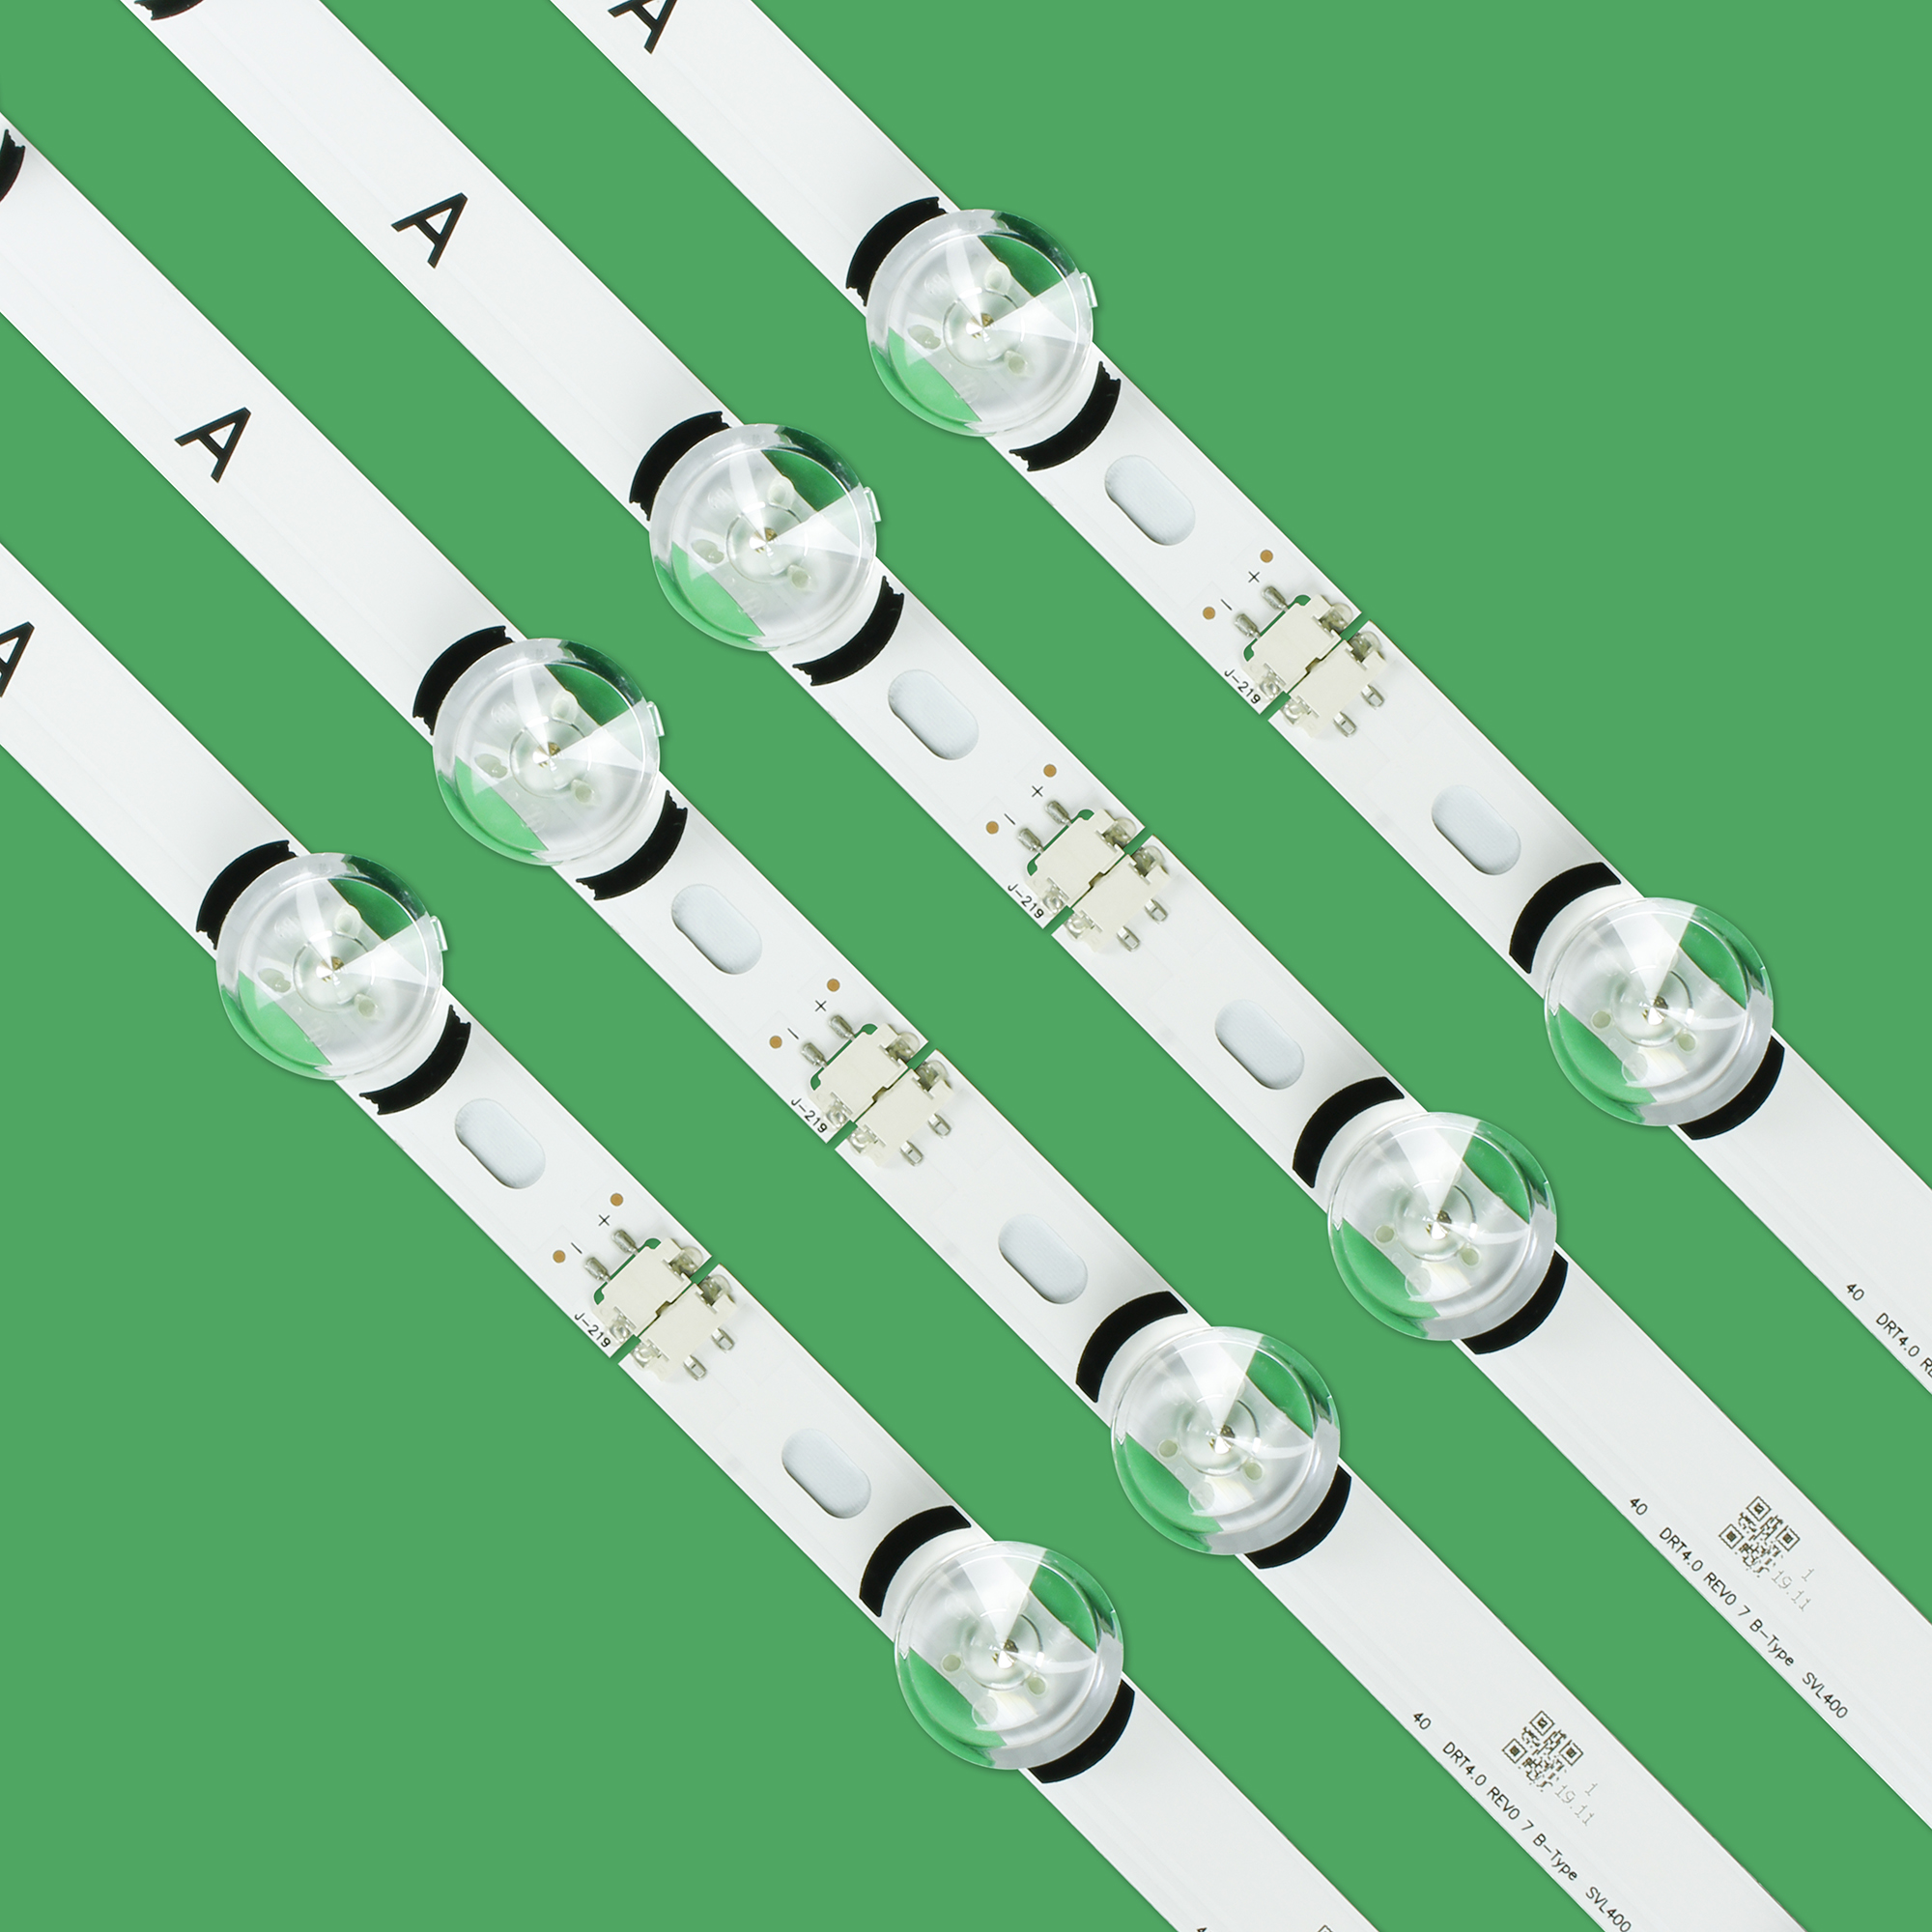 8pcs/set LED Strip For LG 40 DRT4.0 REV0 7 A/B-Type SVL400 6916L-0884A 6916L-0885A 40LF630V 40LX560H 40LH5300 40LH5700 40LF570V